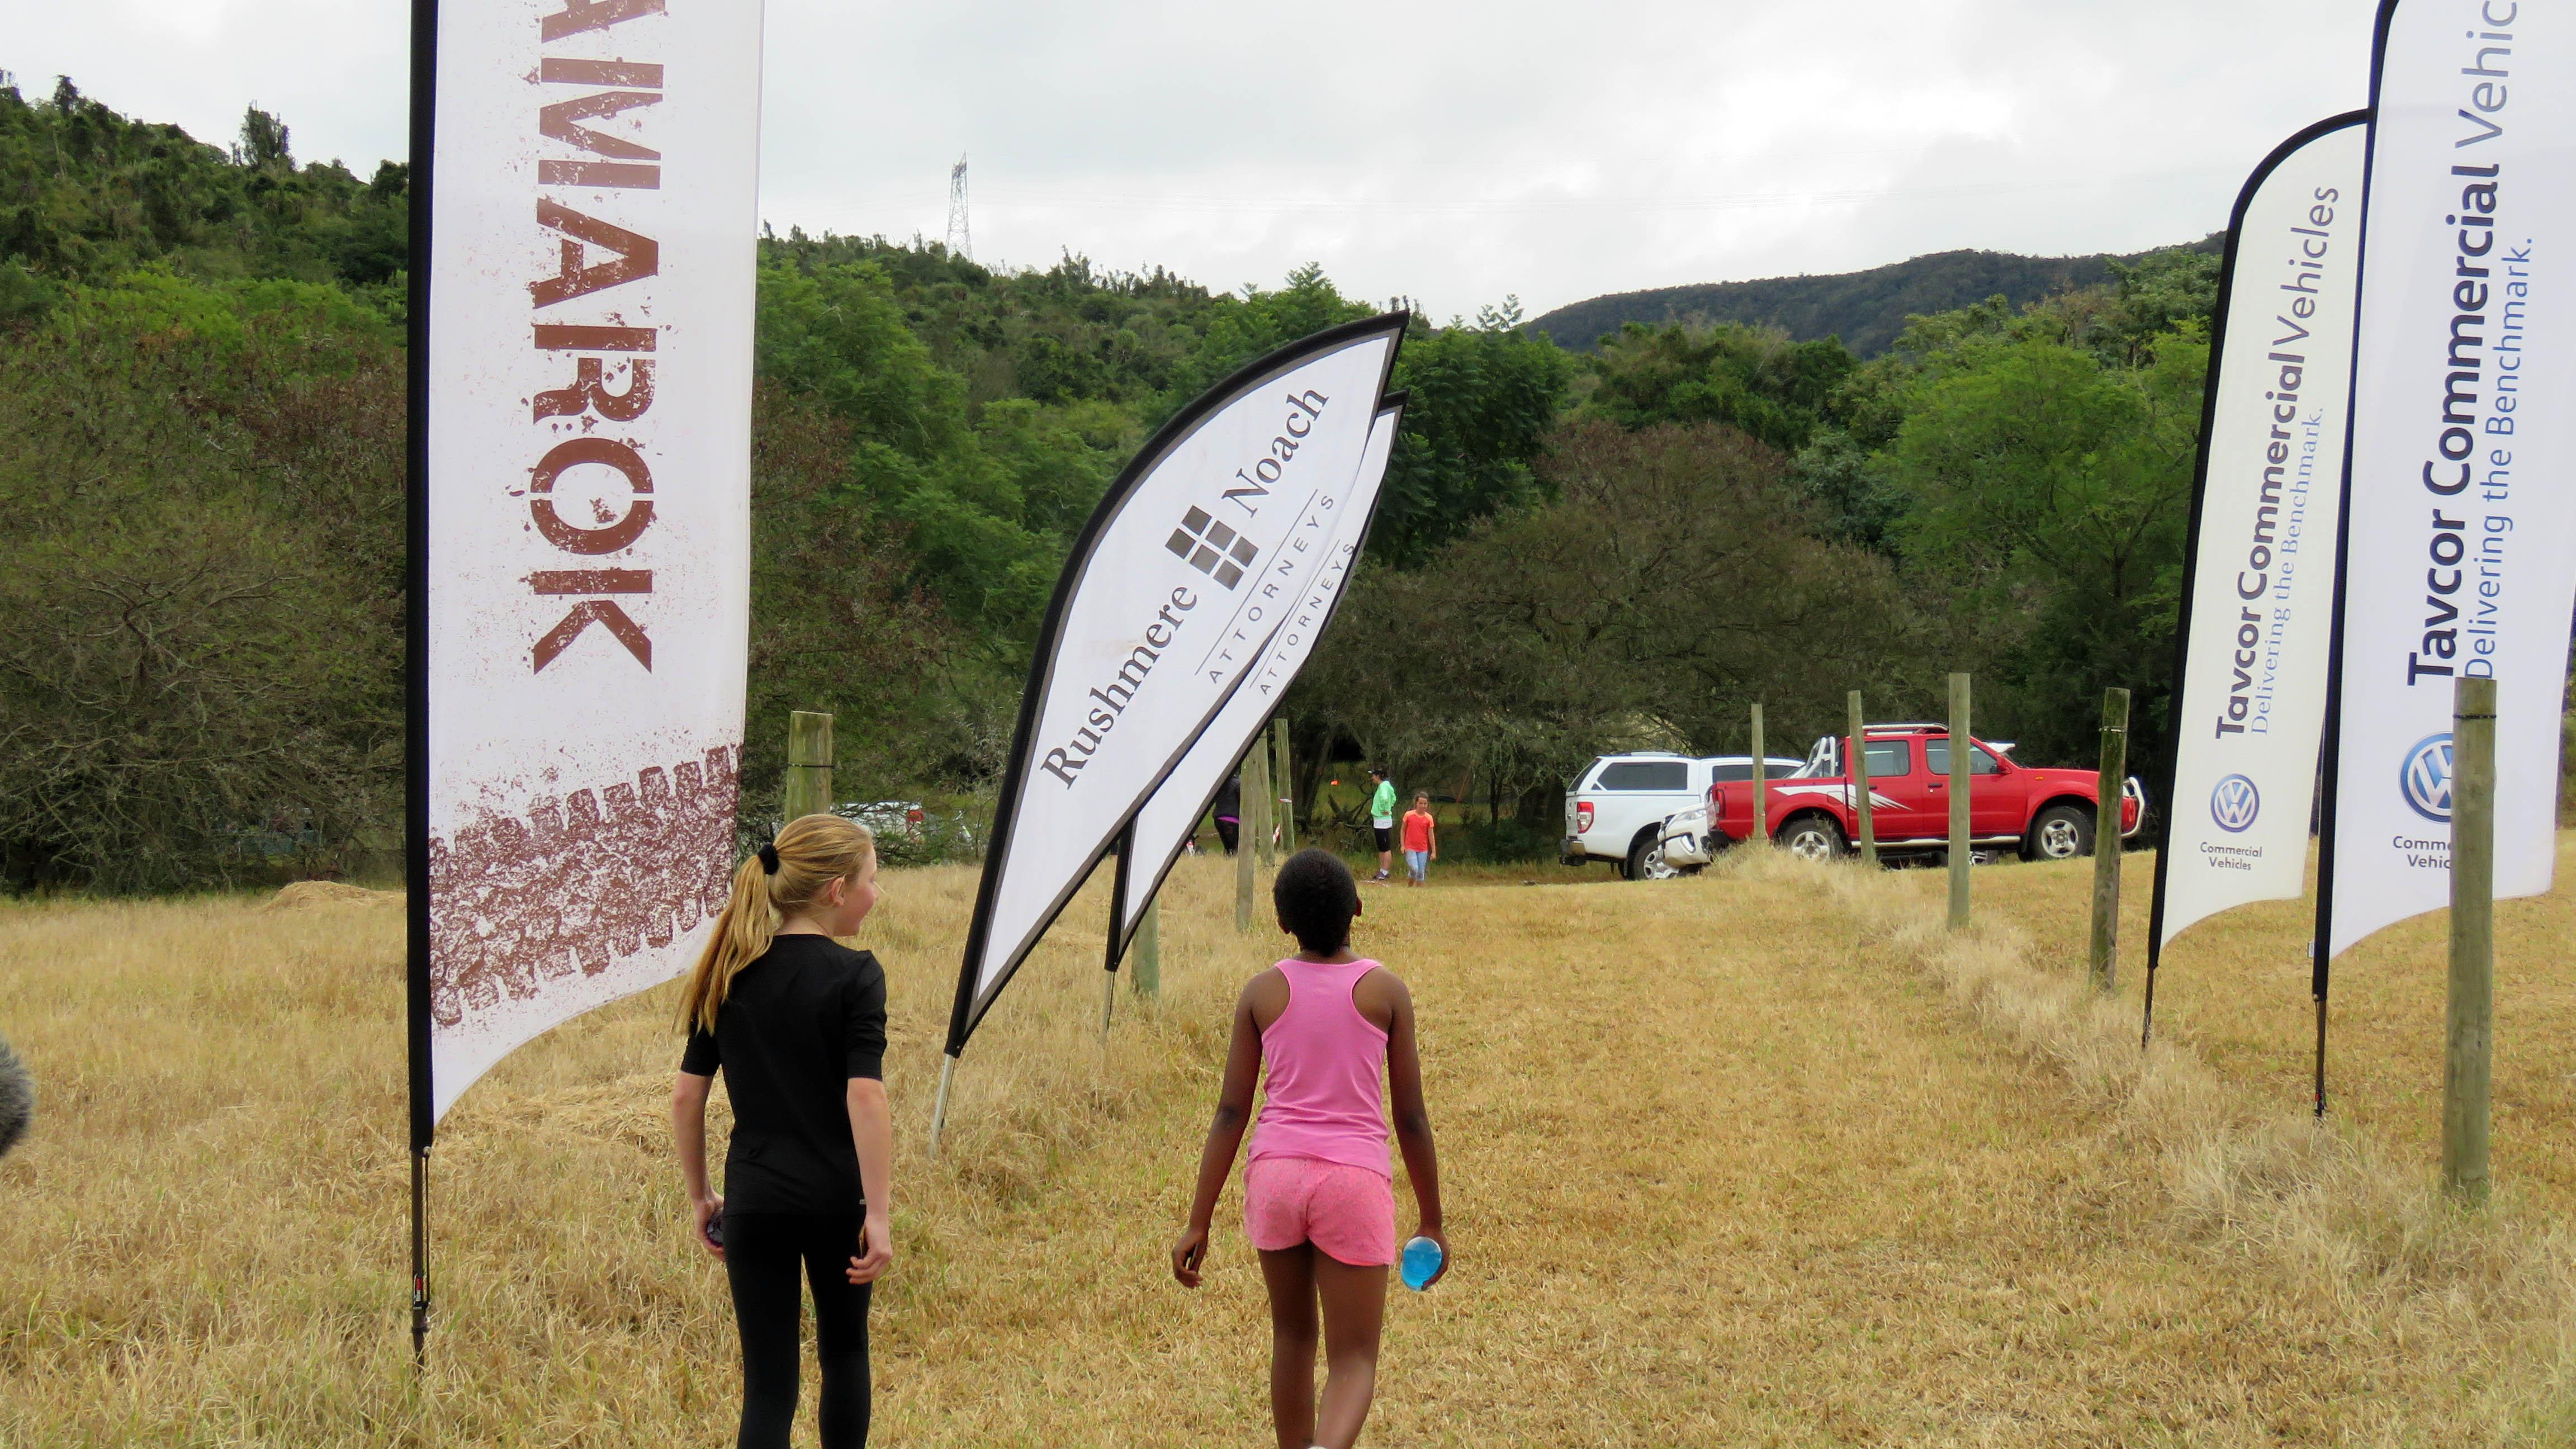 hayterdale trailrun 2018-08-05  (113)